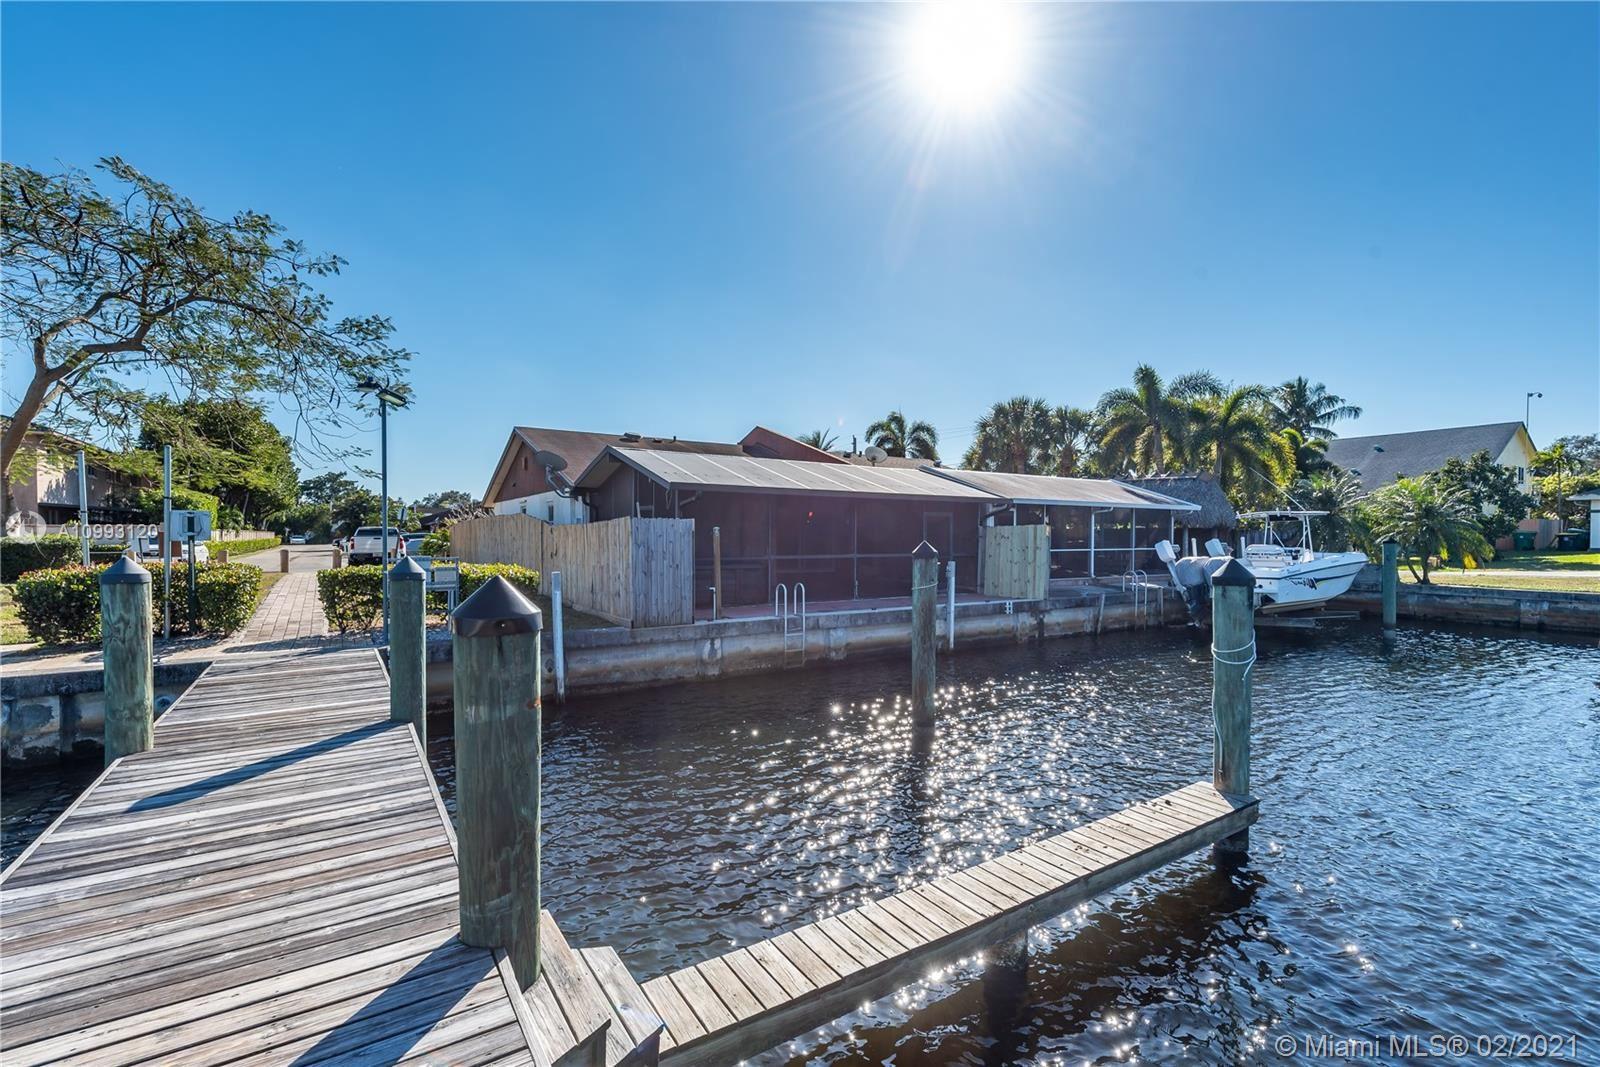 Photo of 4481 Treasure Cove Dr #4481, Dania Beach, FL 33312 (MLS # A10993120)